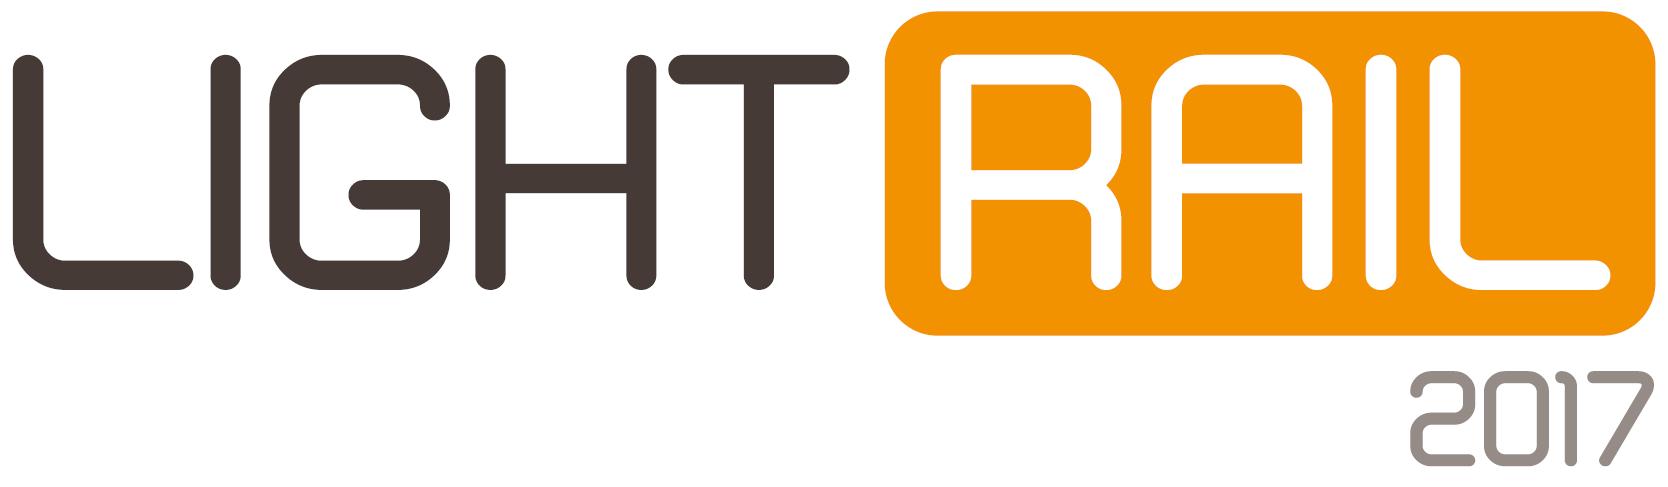 LightRail 2017